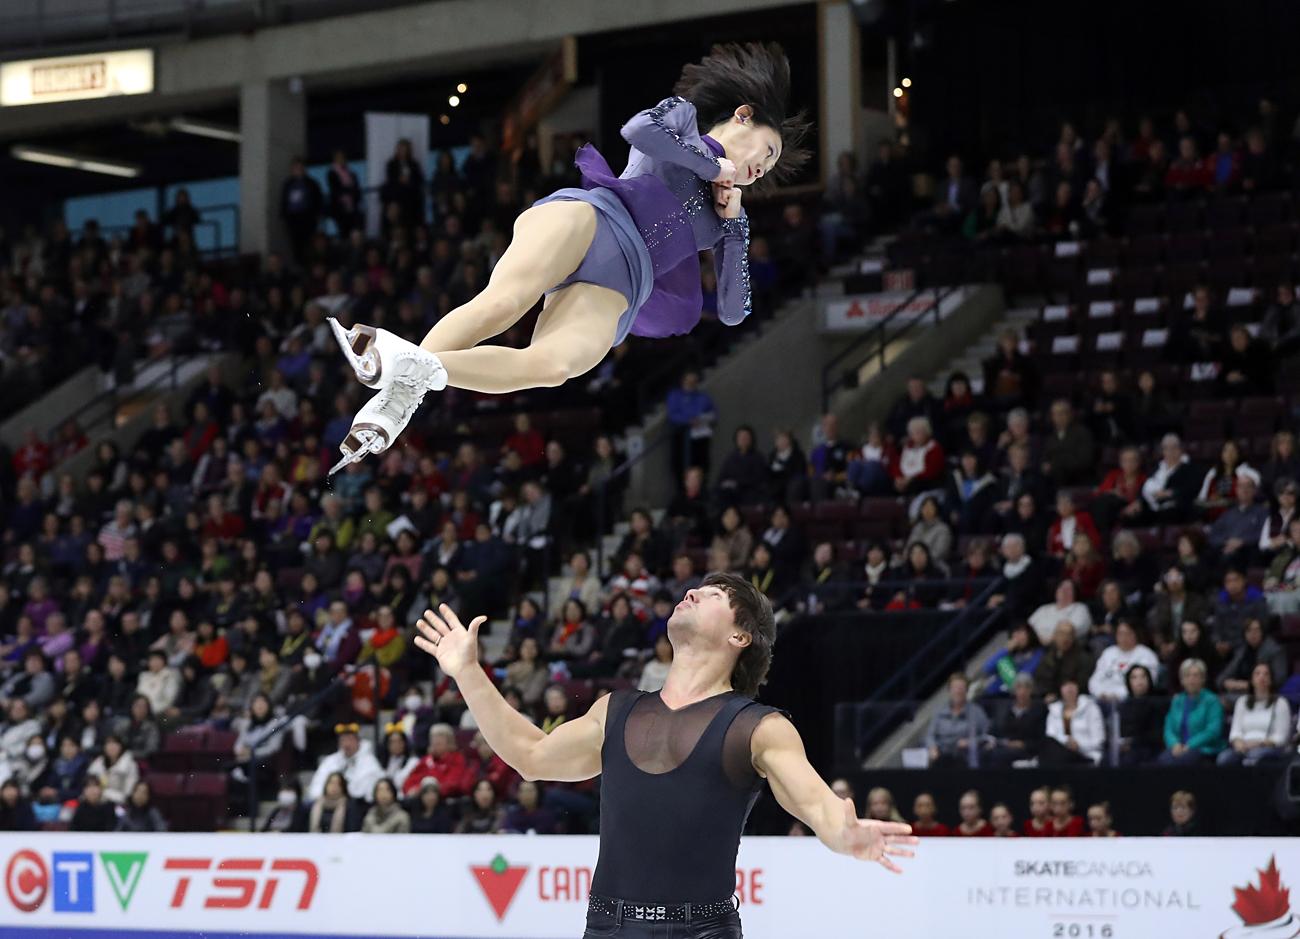 Yuko Kawaguchi et Alexander Smirnov. Crédit : Getty Images